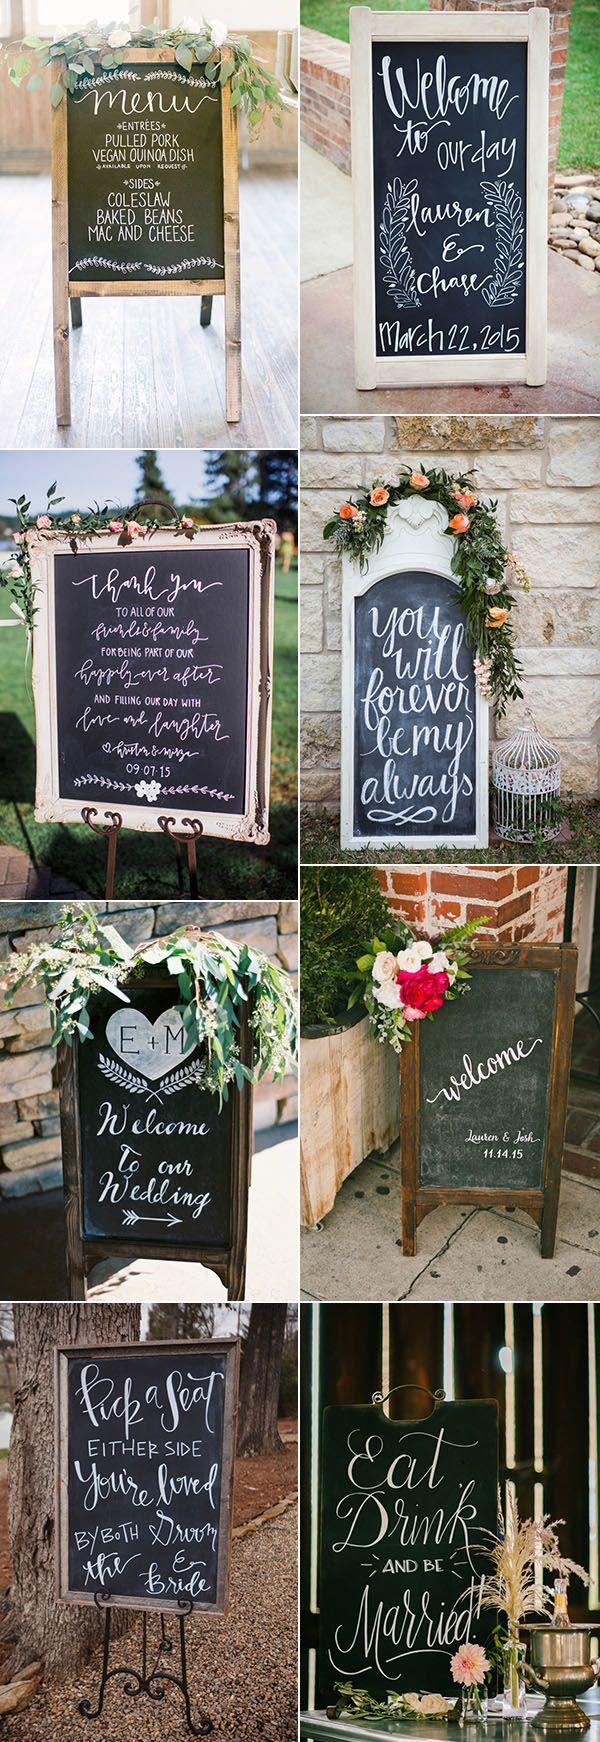 chalkboard wedding sign ideas for your big day